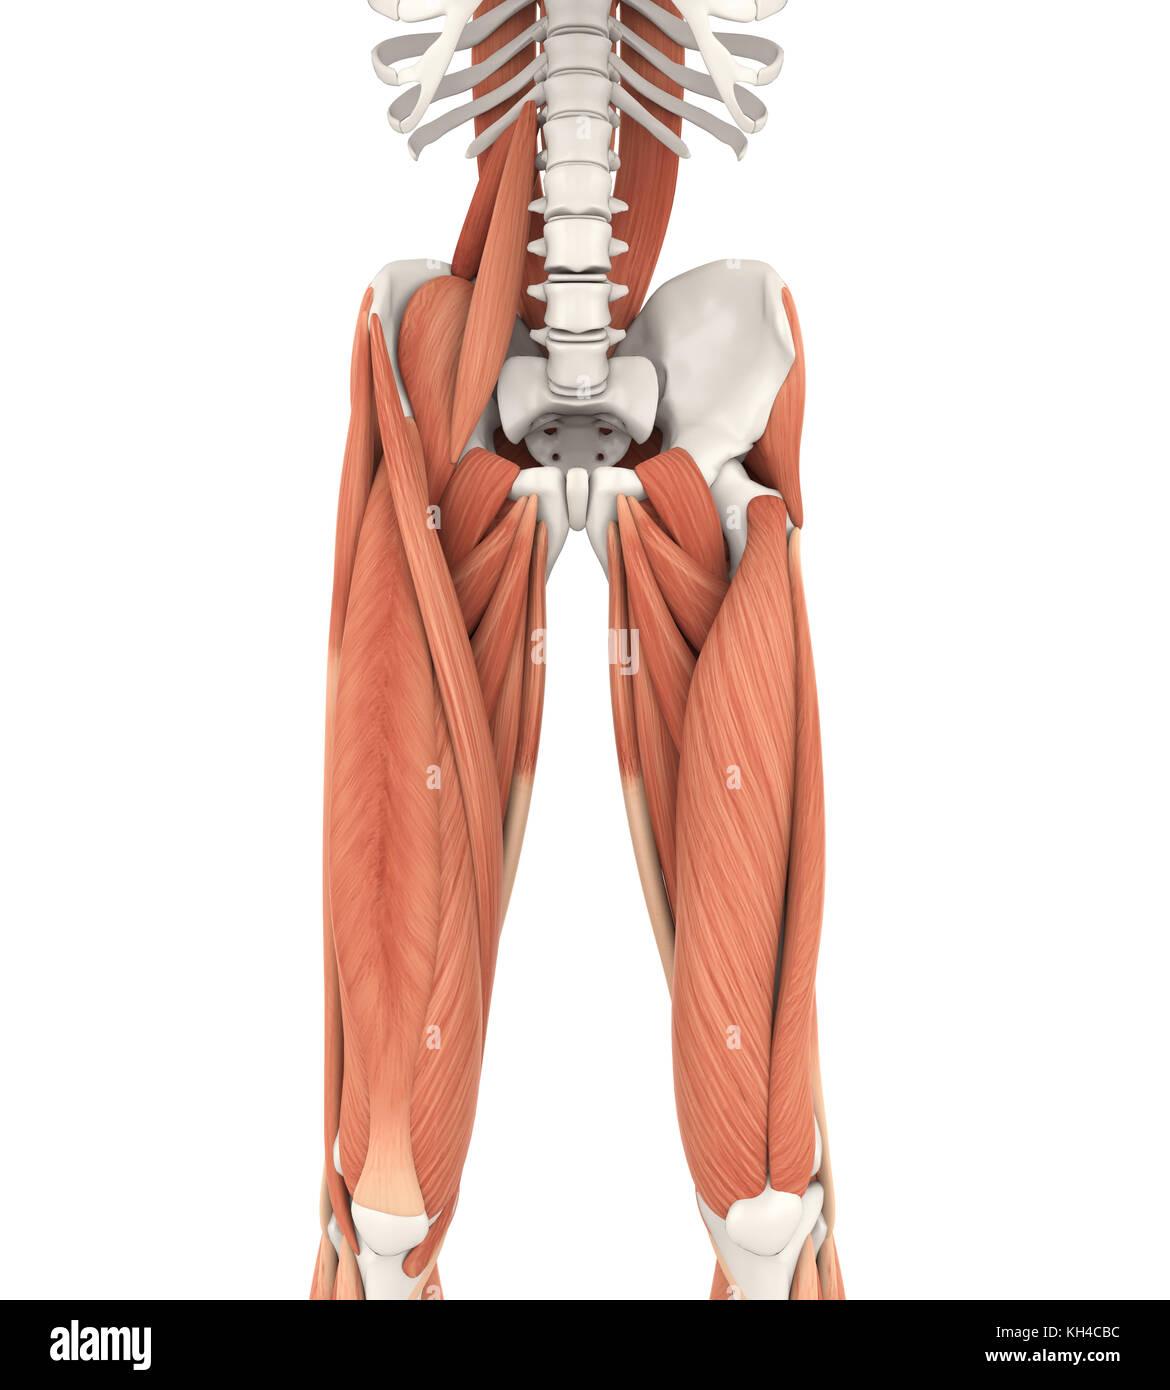 Ischial Spine Stockfotos & Ischial Spine Bilder - Alamy